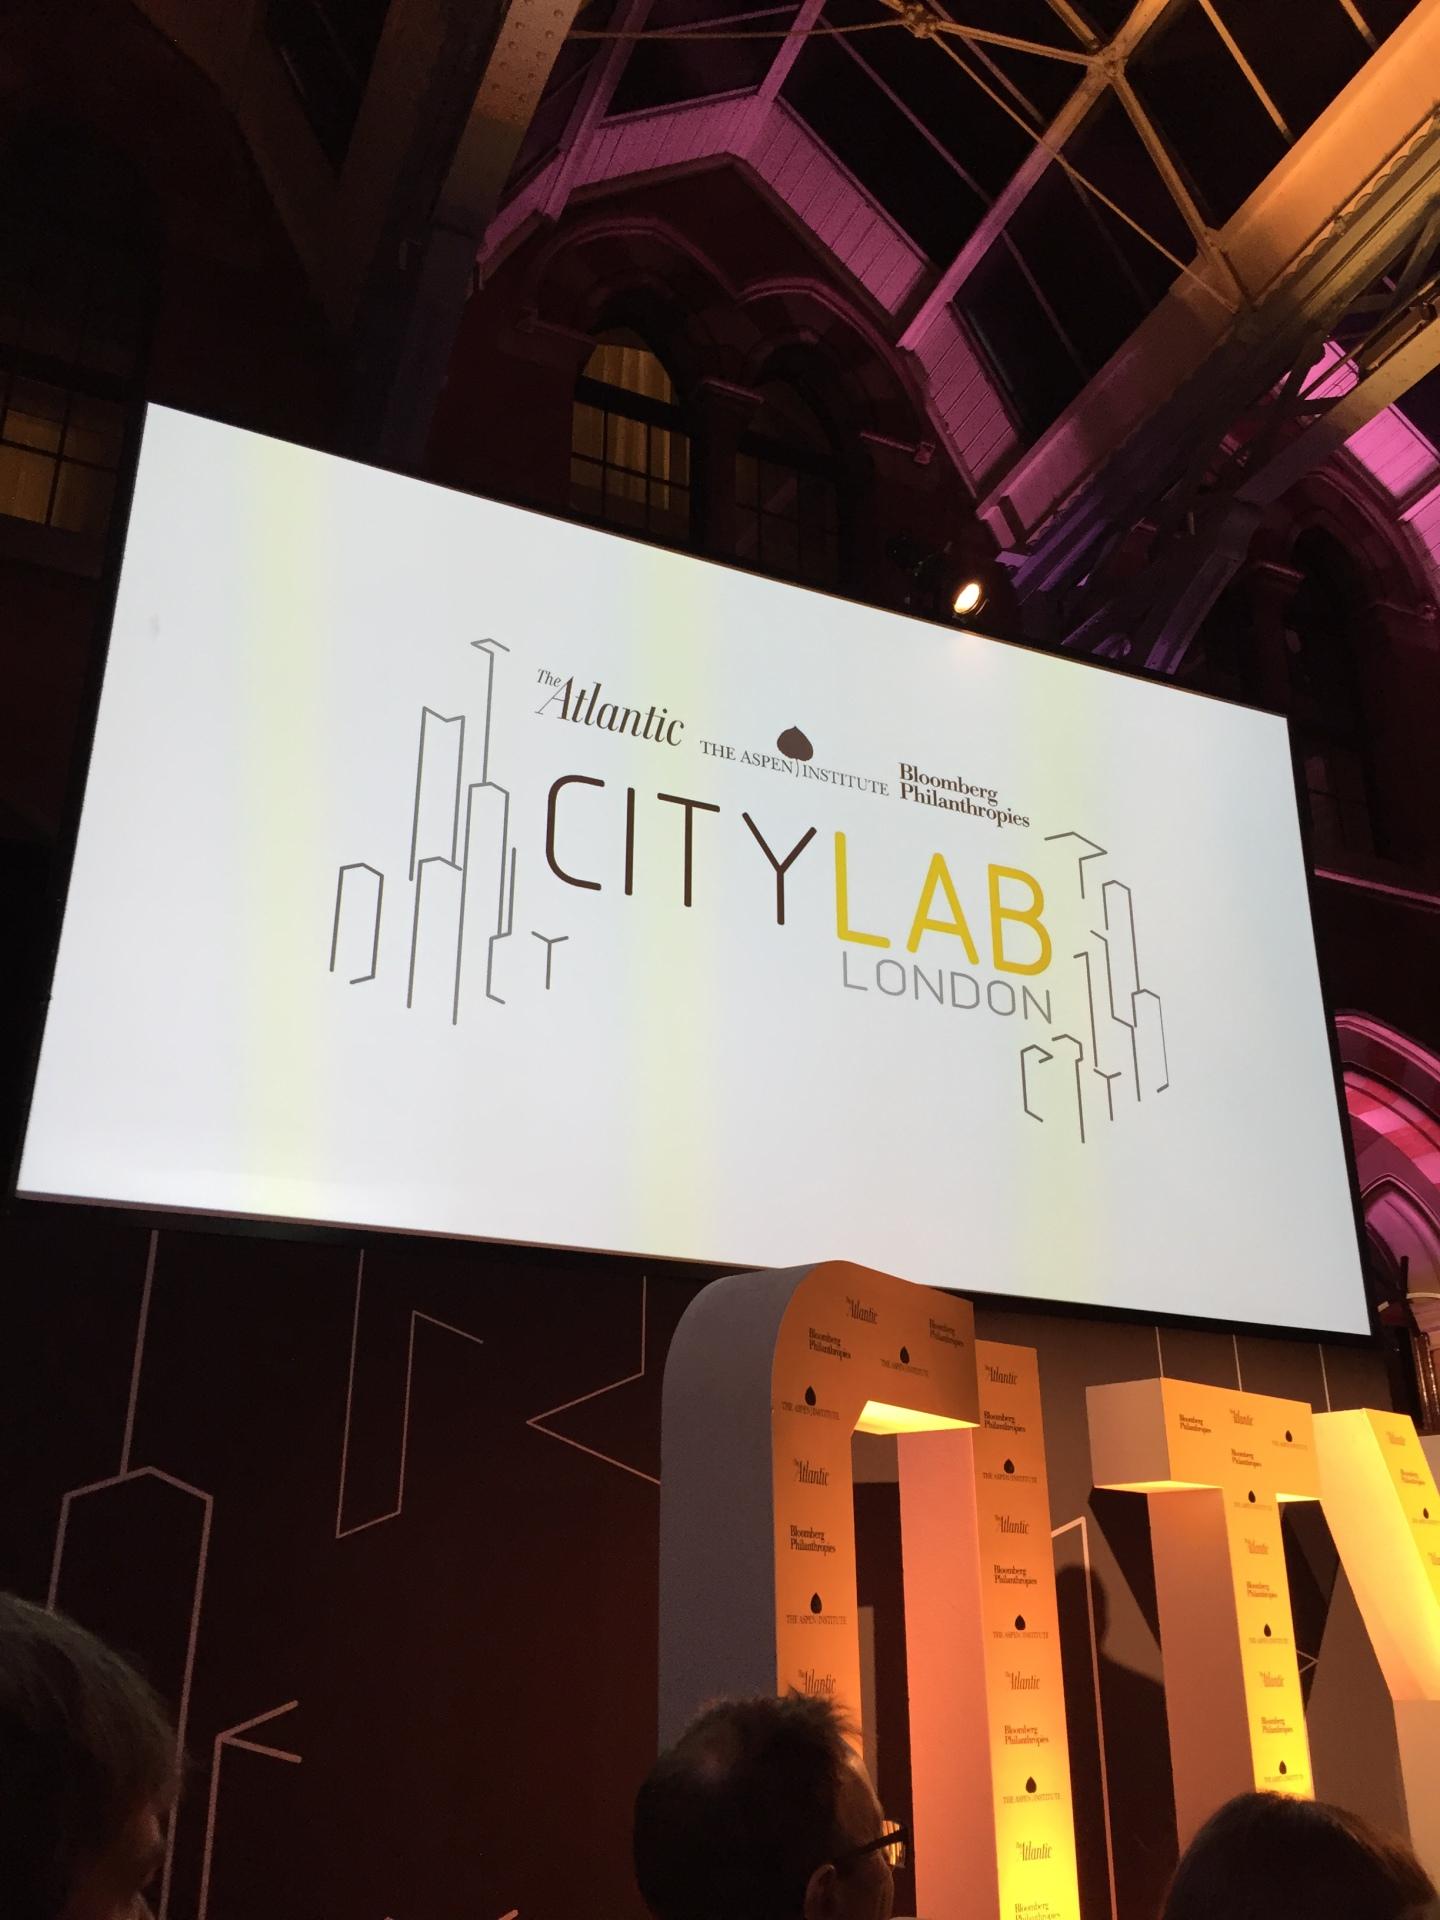 Post CityLab 2015